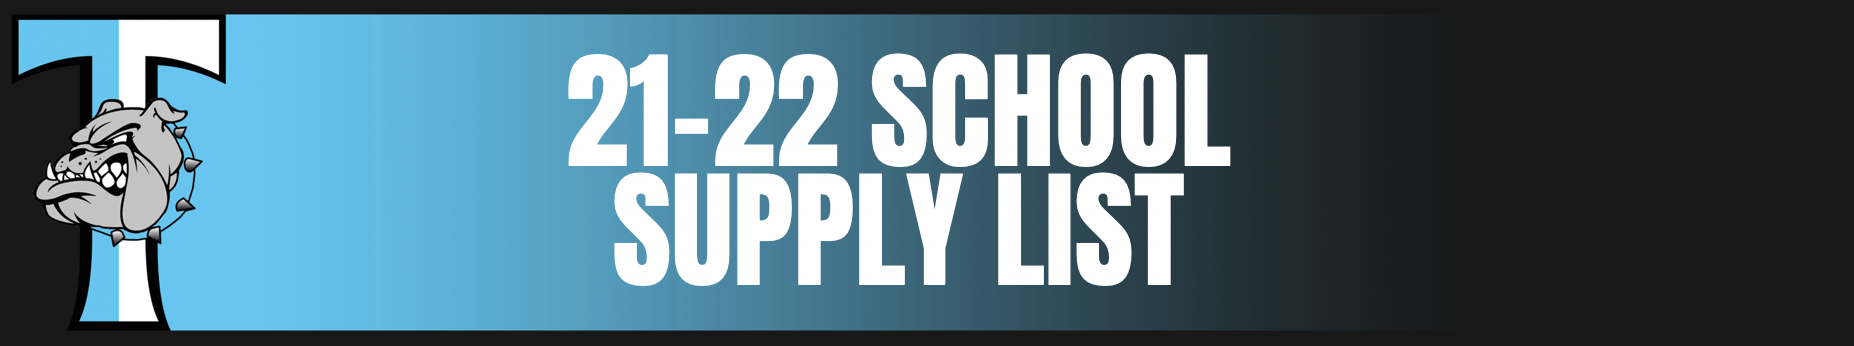 21-22 Supply List Header